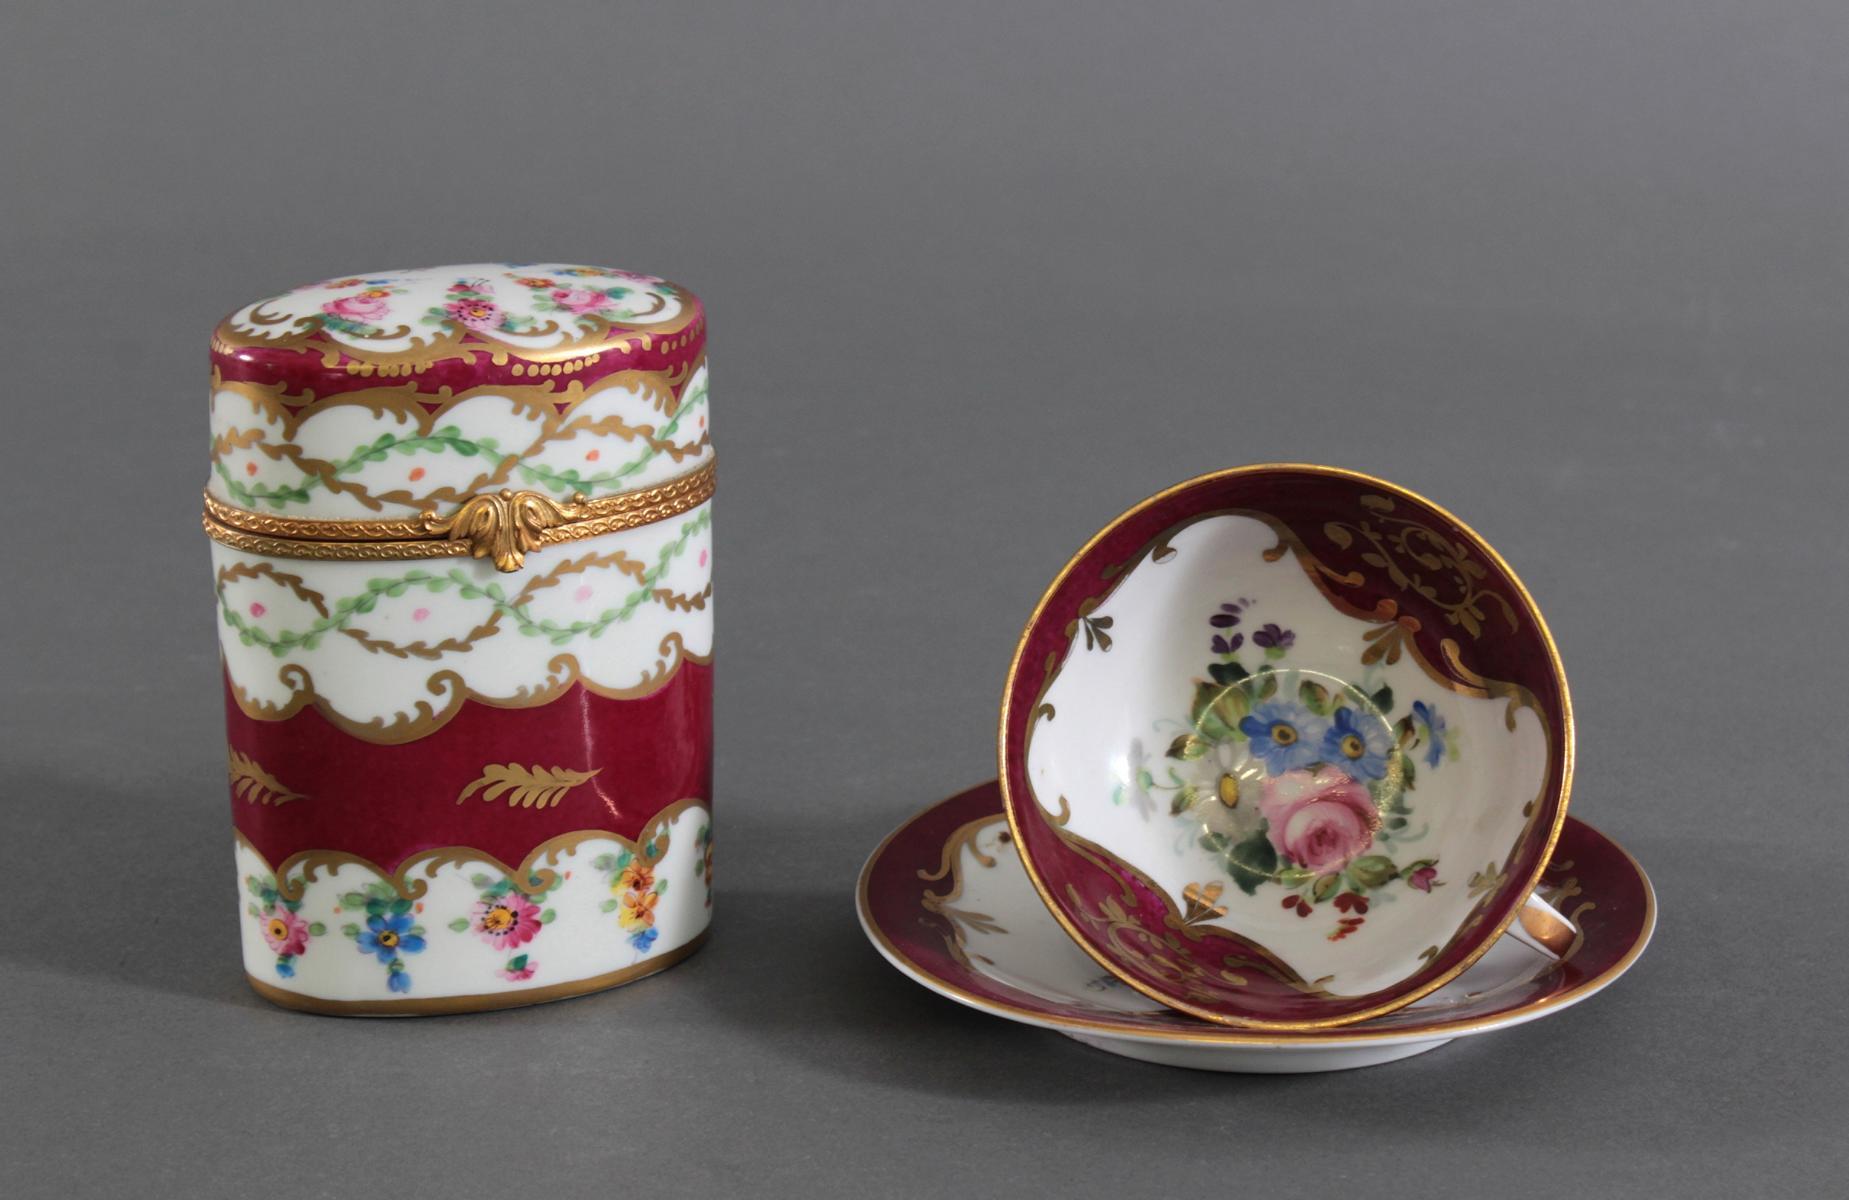 Drei Teile Porzellan, vermutlich Paris, Edmé Samson, Ende 19. Jh.-2